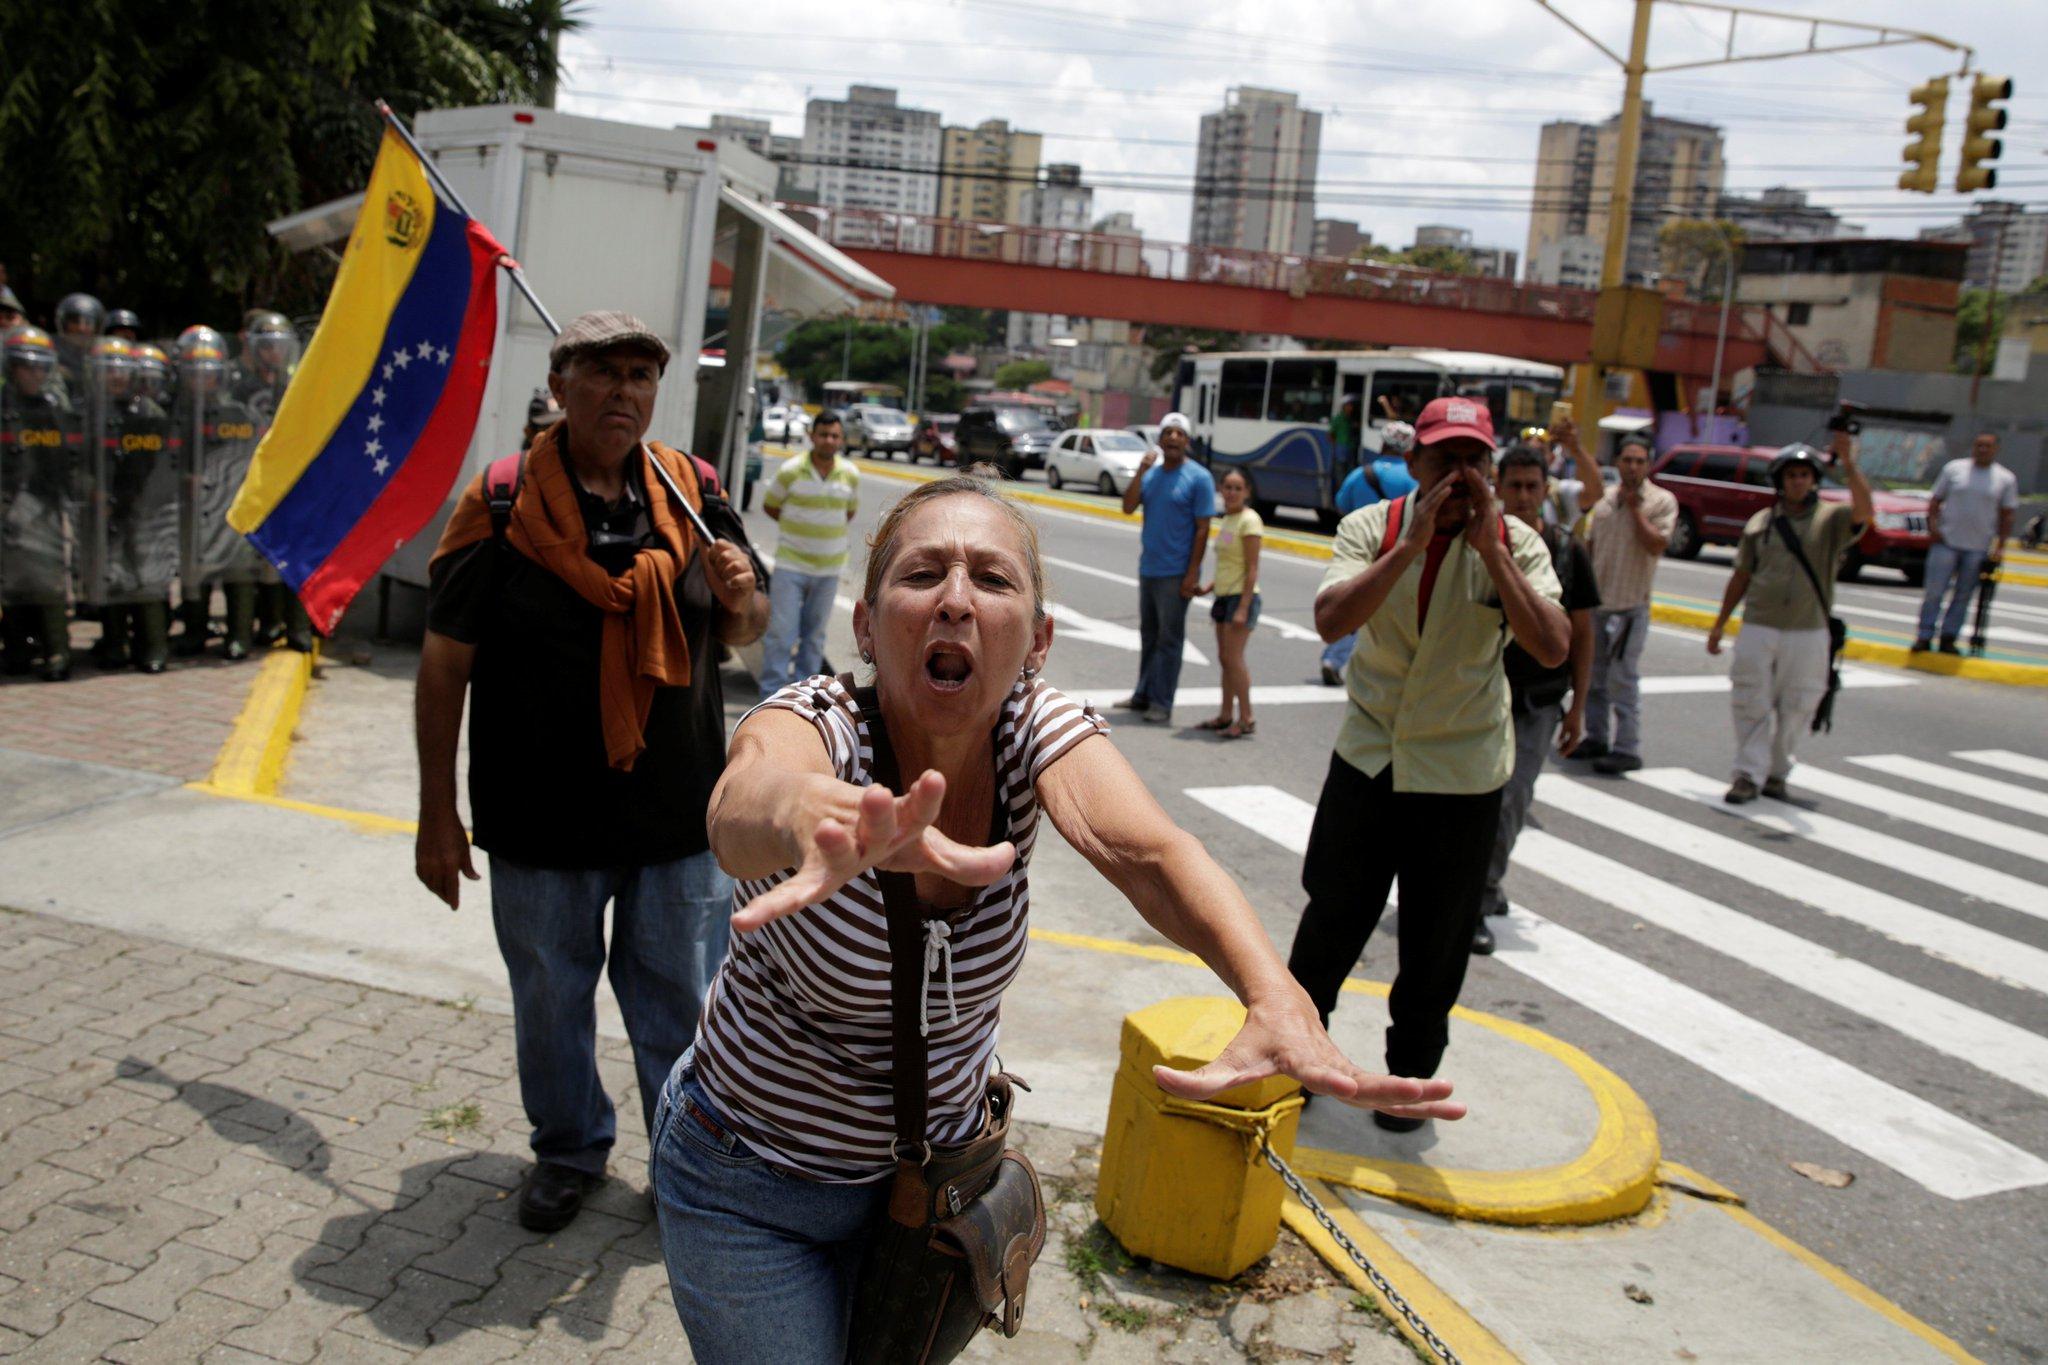 México y Colombia se declaran preocupados por recrudecimiento de crisis en Venezuela https://t.co/c6363E2507 https://t.co/ApnuOqjNlL